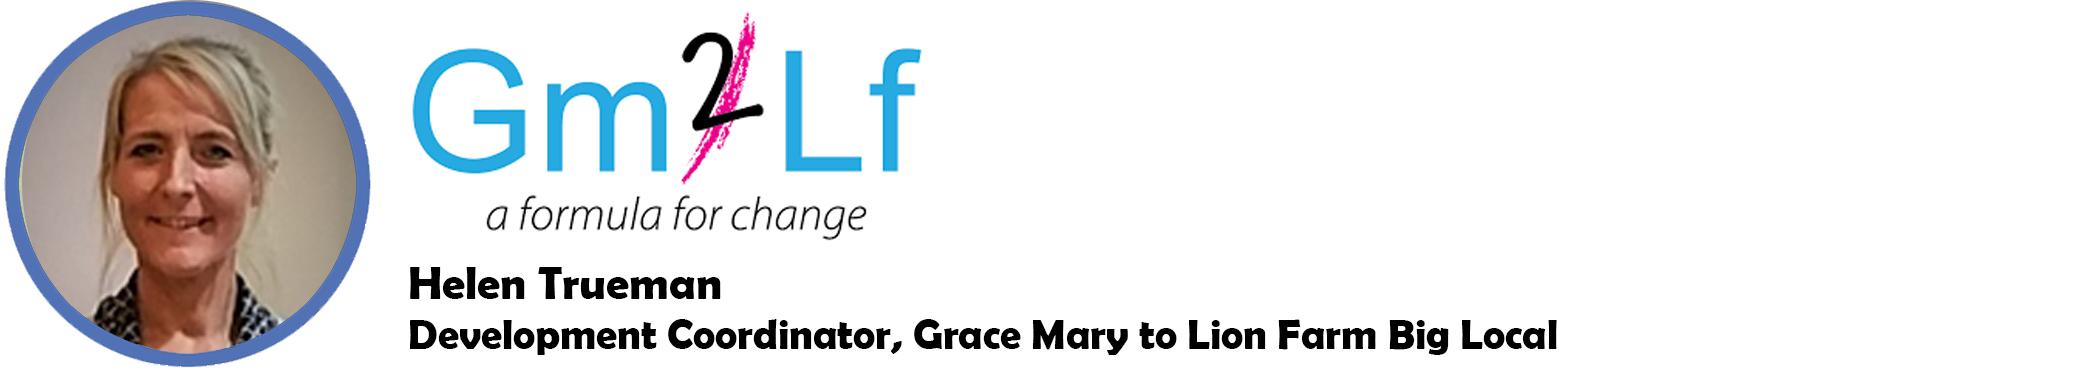 Helen Trueman - Development Coordinator, Grace Mary to Lion Farm Big Local